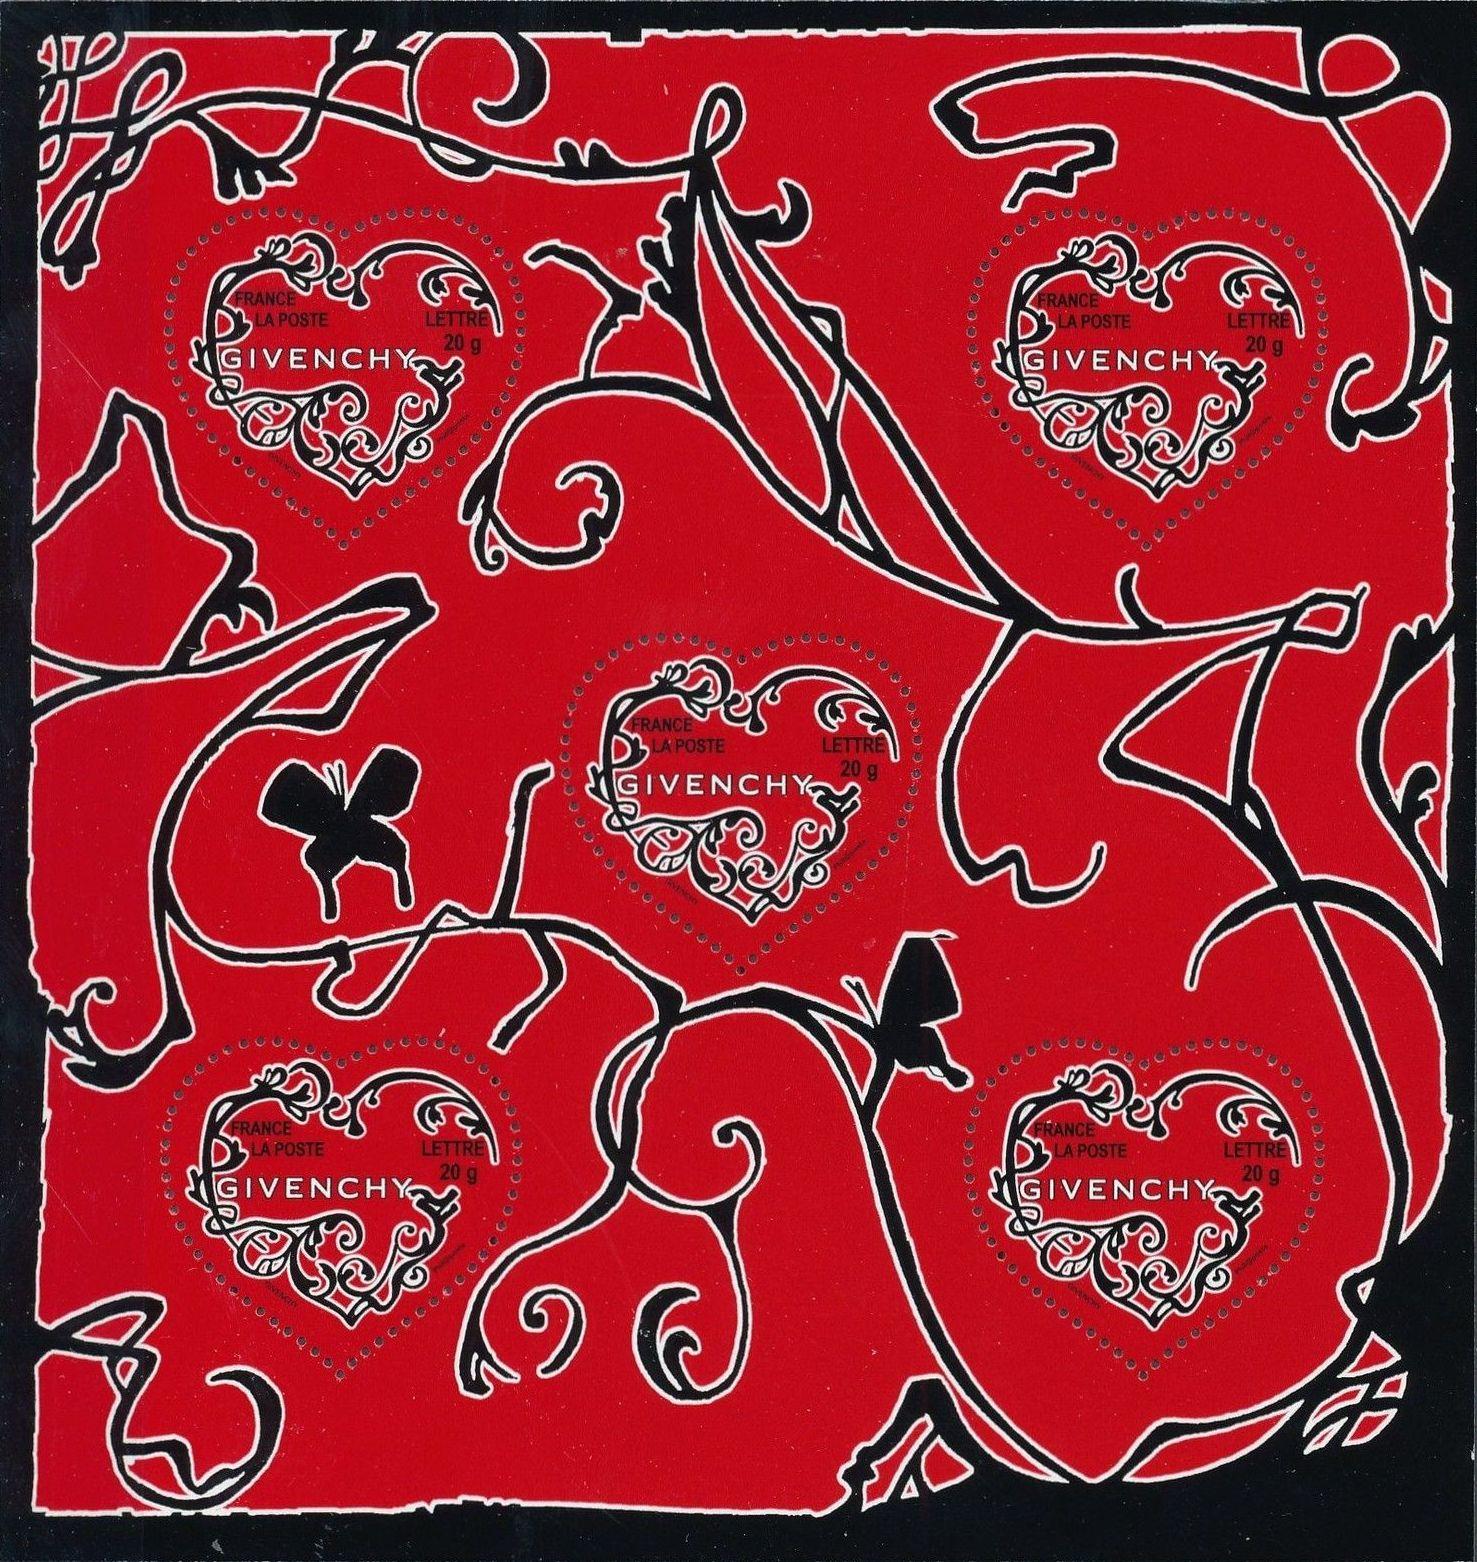 France 2007 Valentine's Day